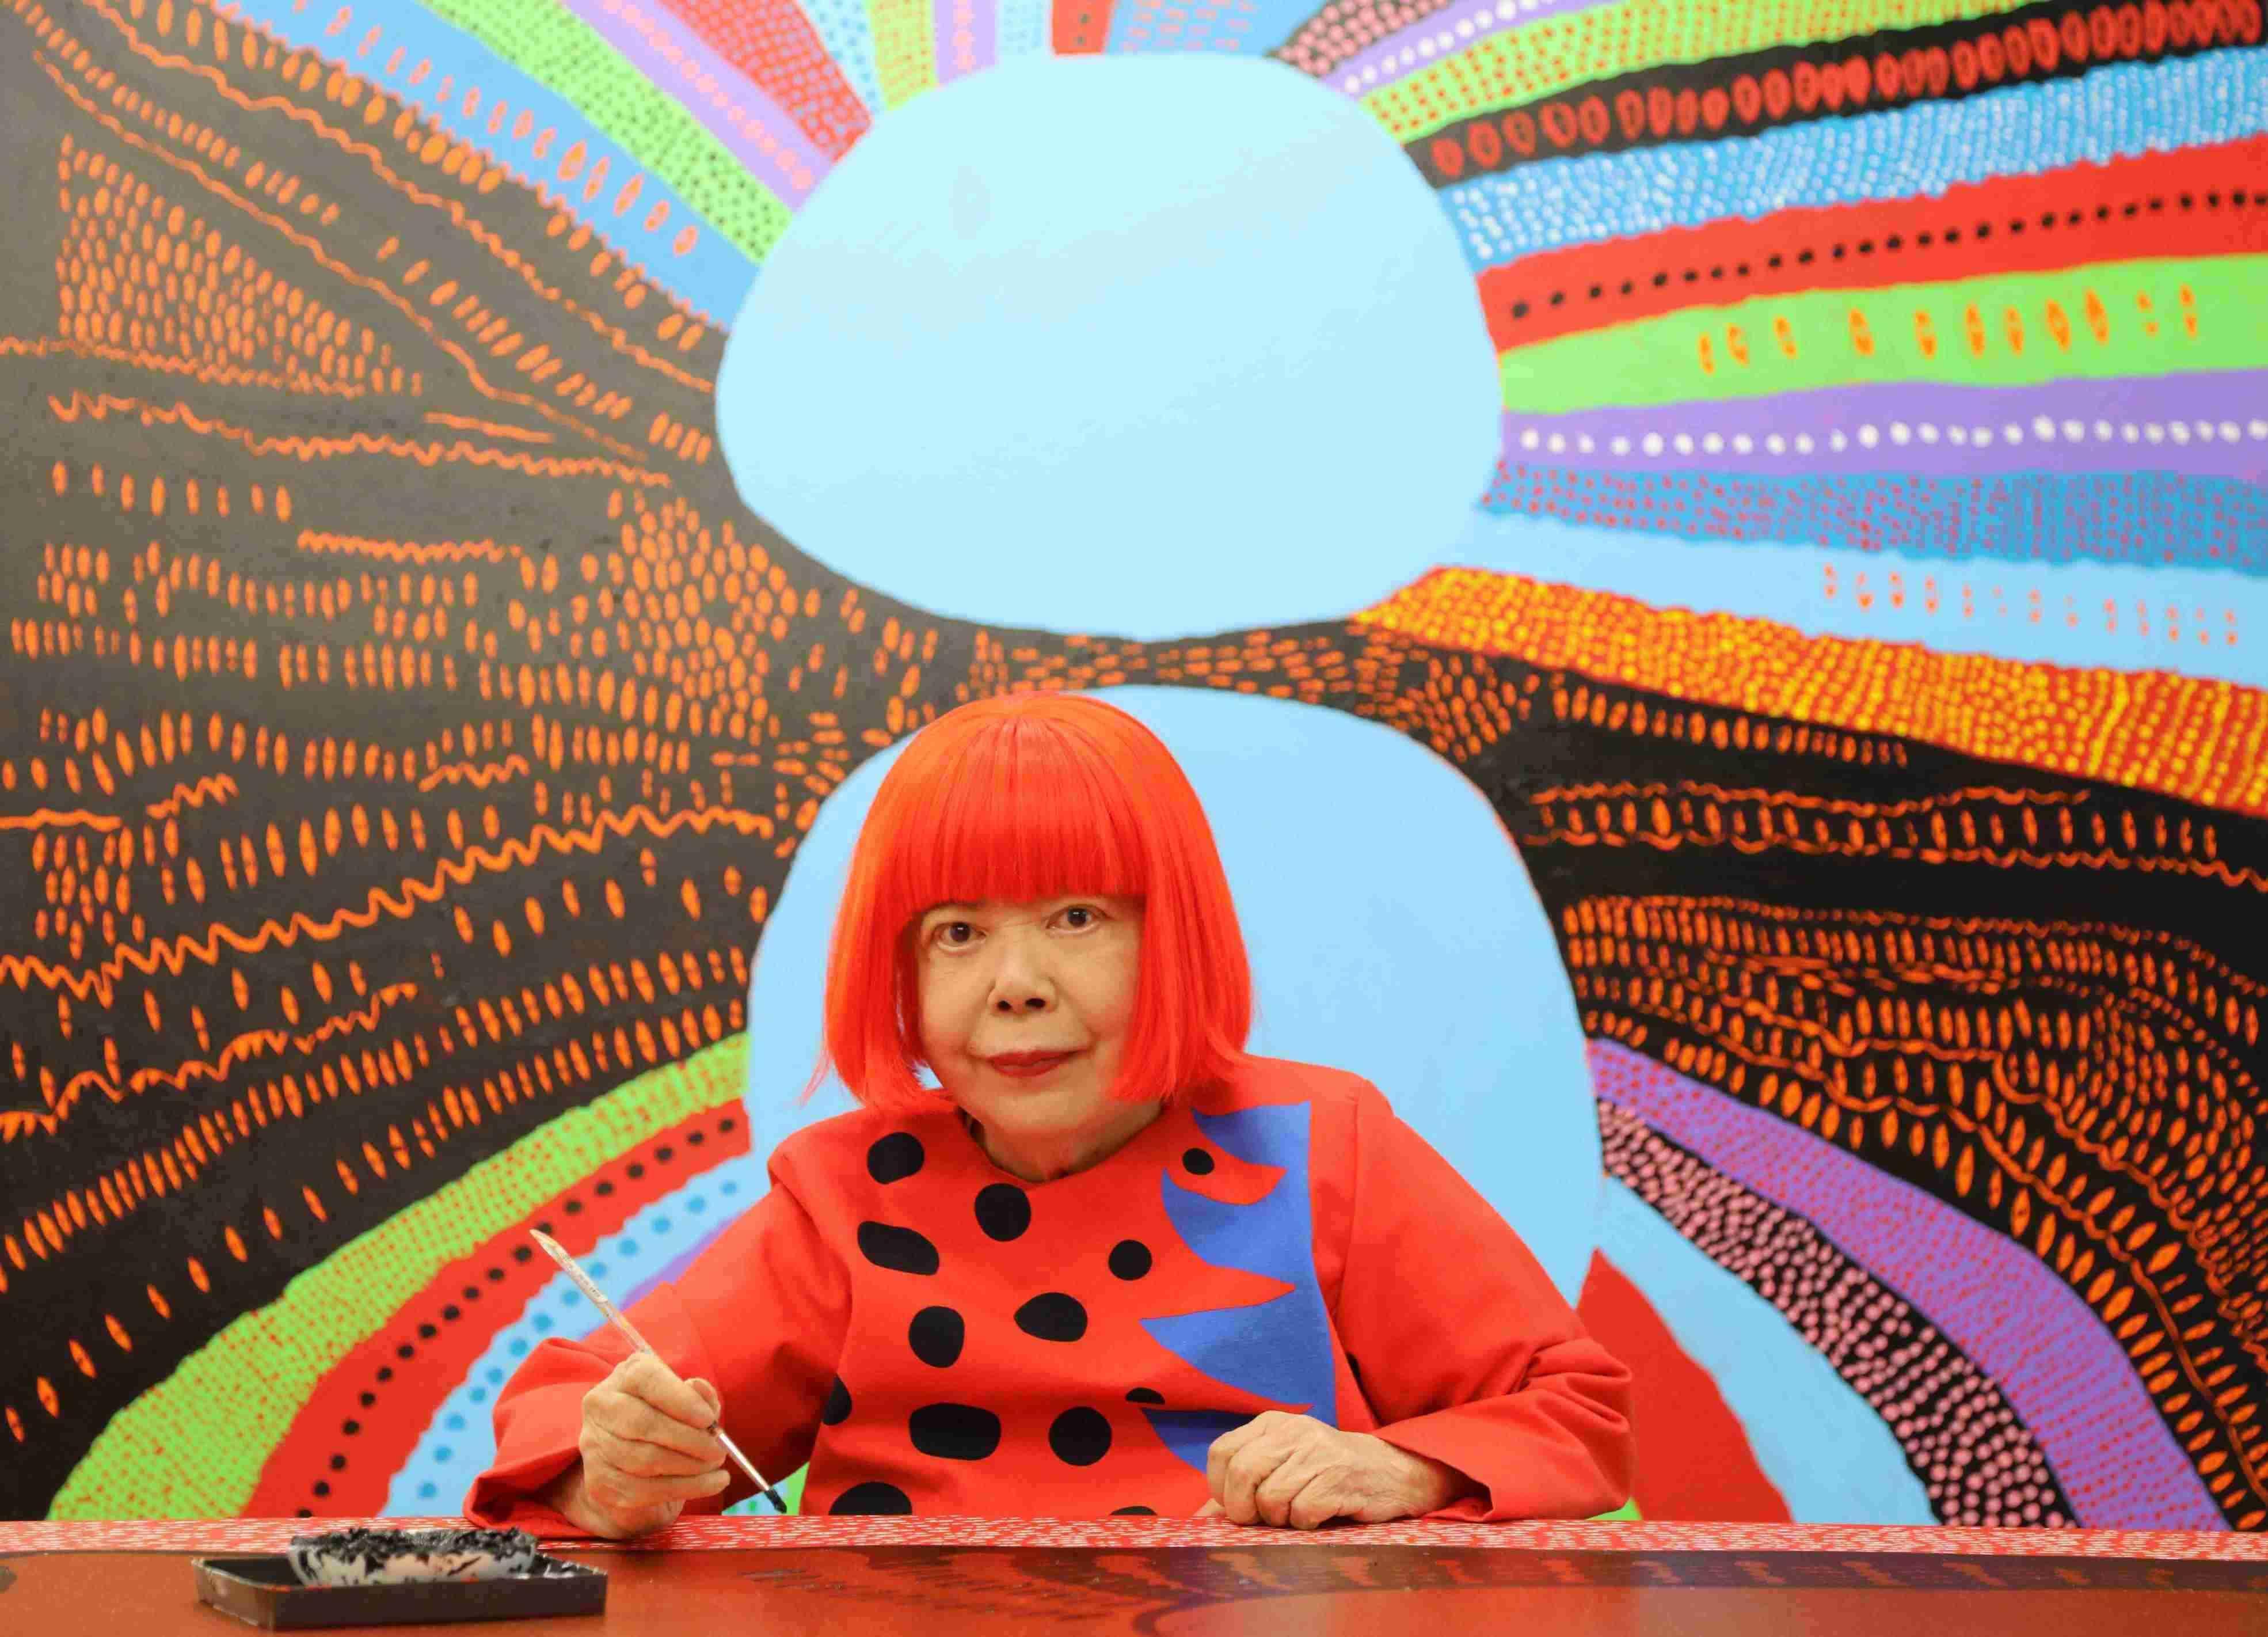 Yayoi Kusama Museum opens in Tokyo (amuzen article)